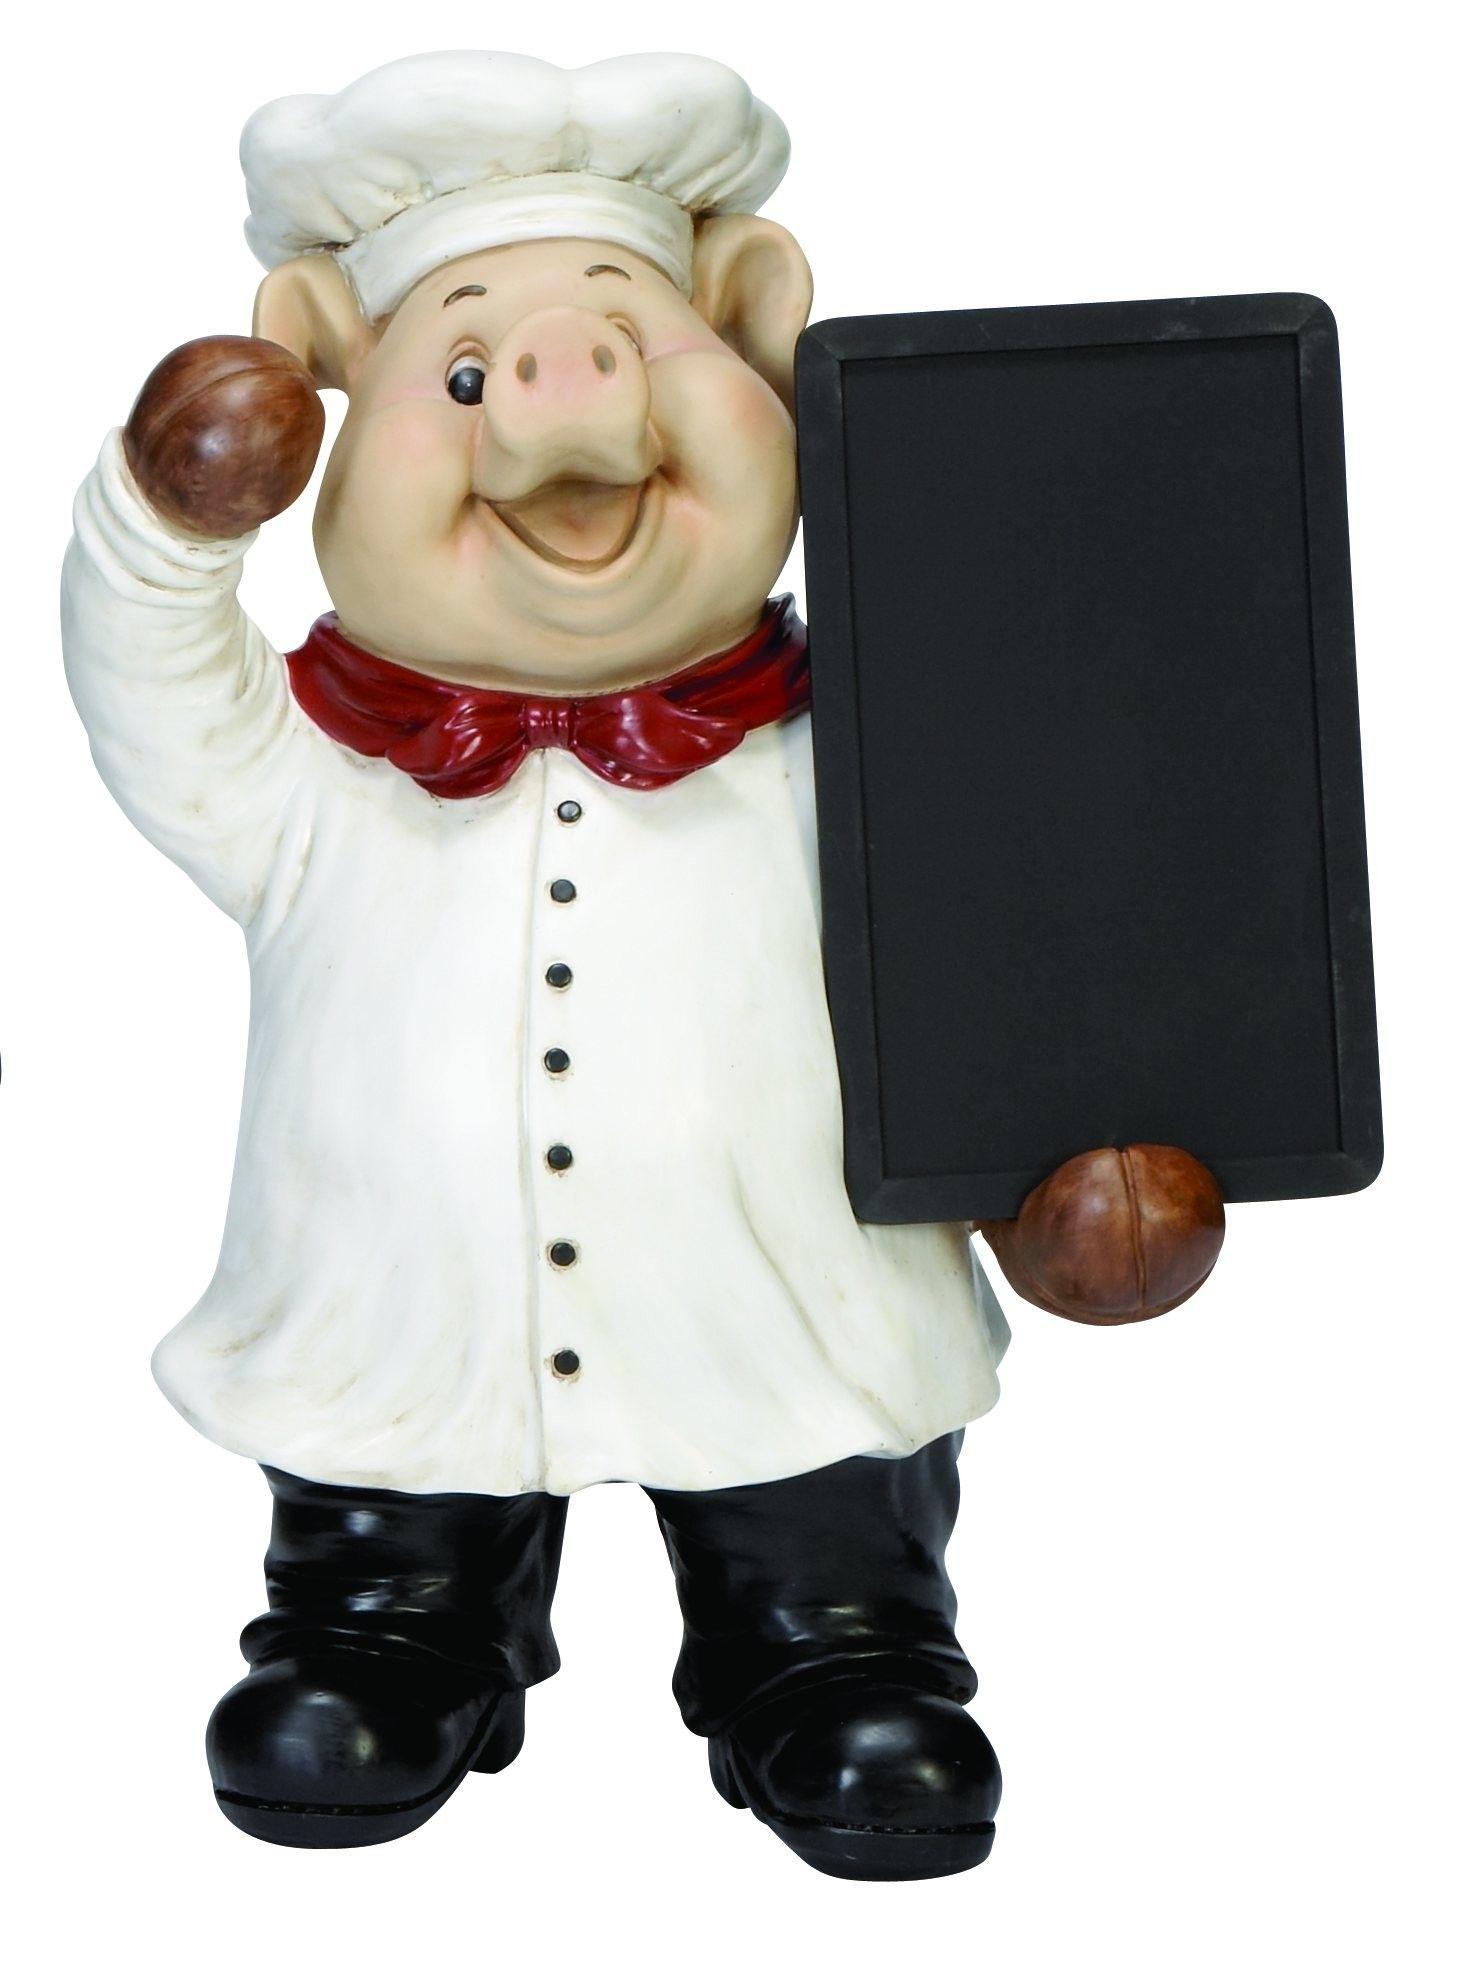 Pig Chef Figurine Chalkboard With